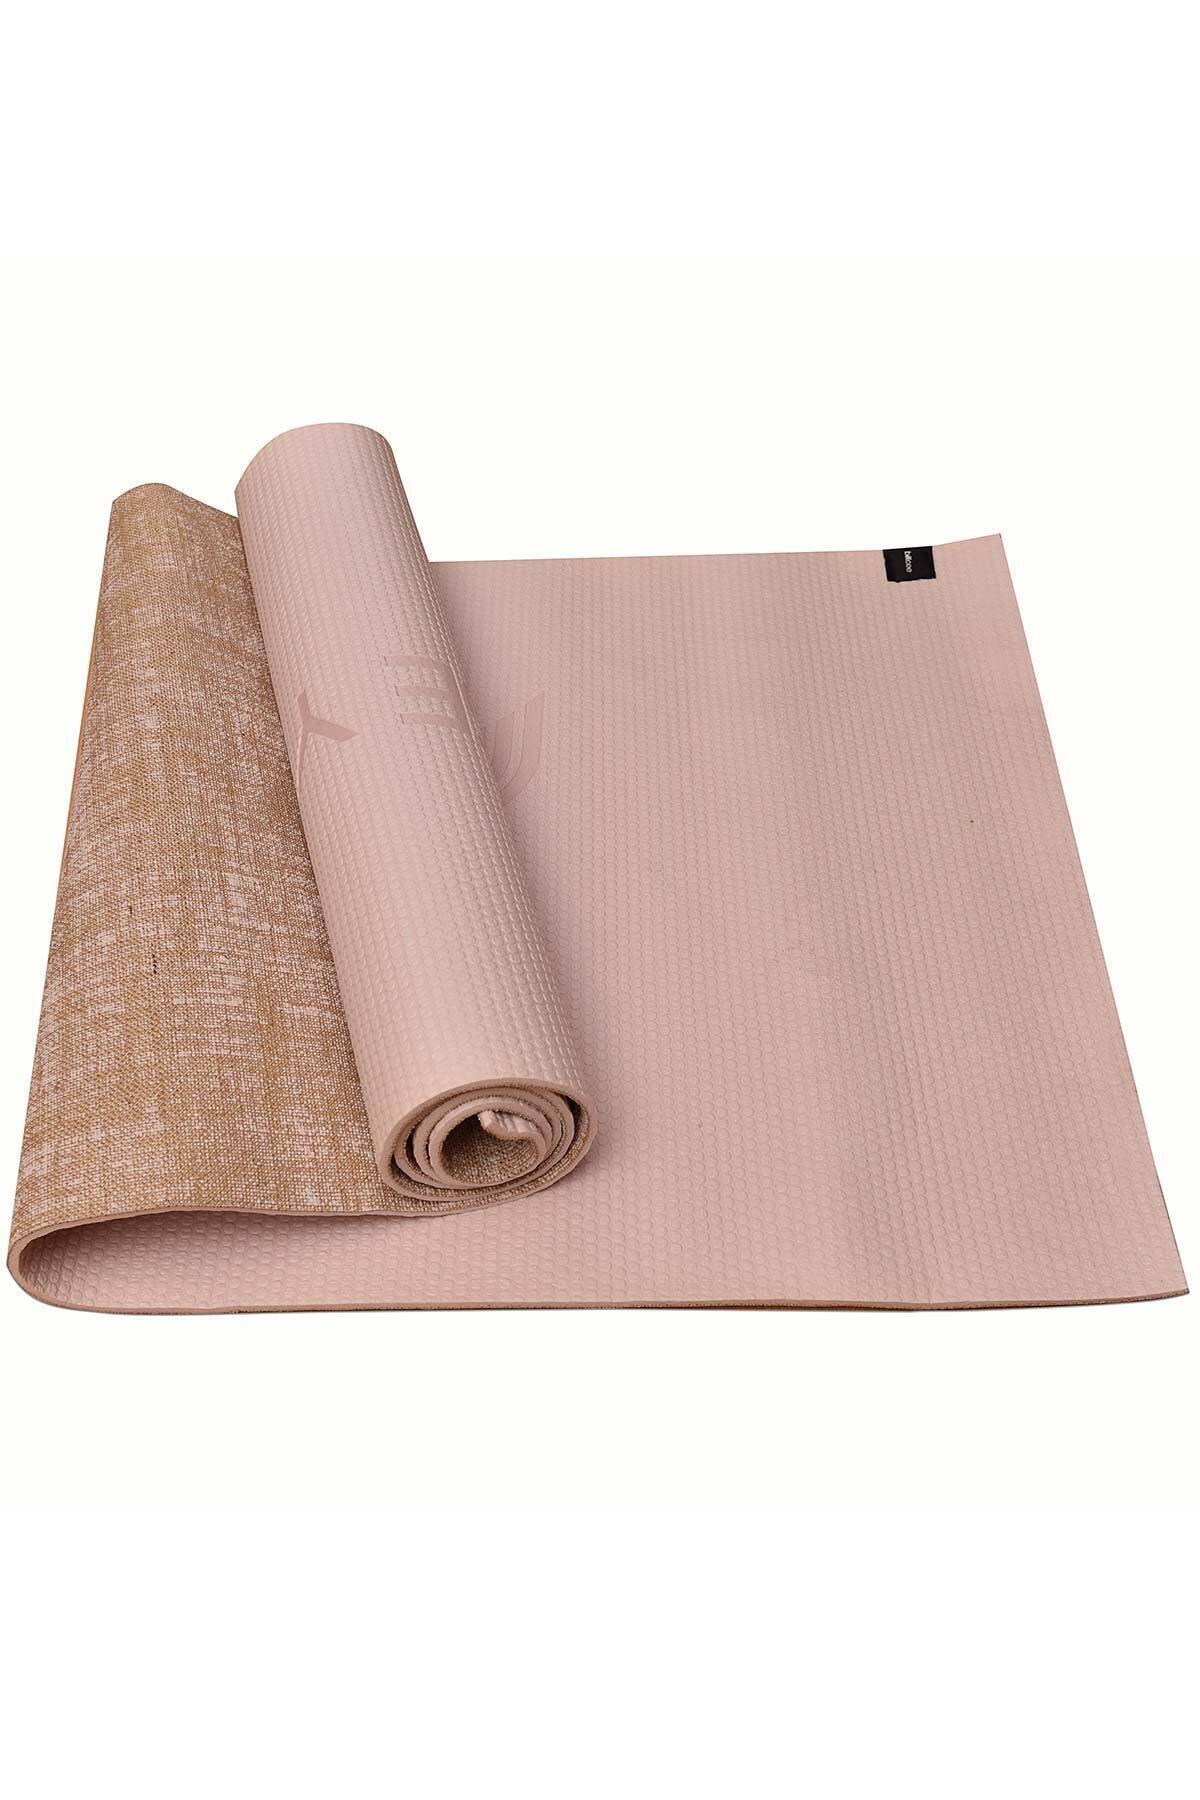 bilcee Bej Yoga Mat CB-654 1